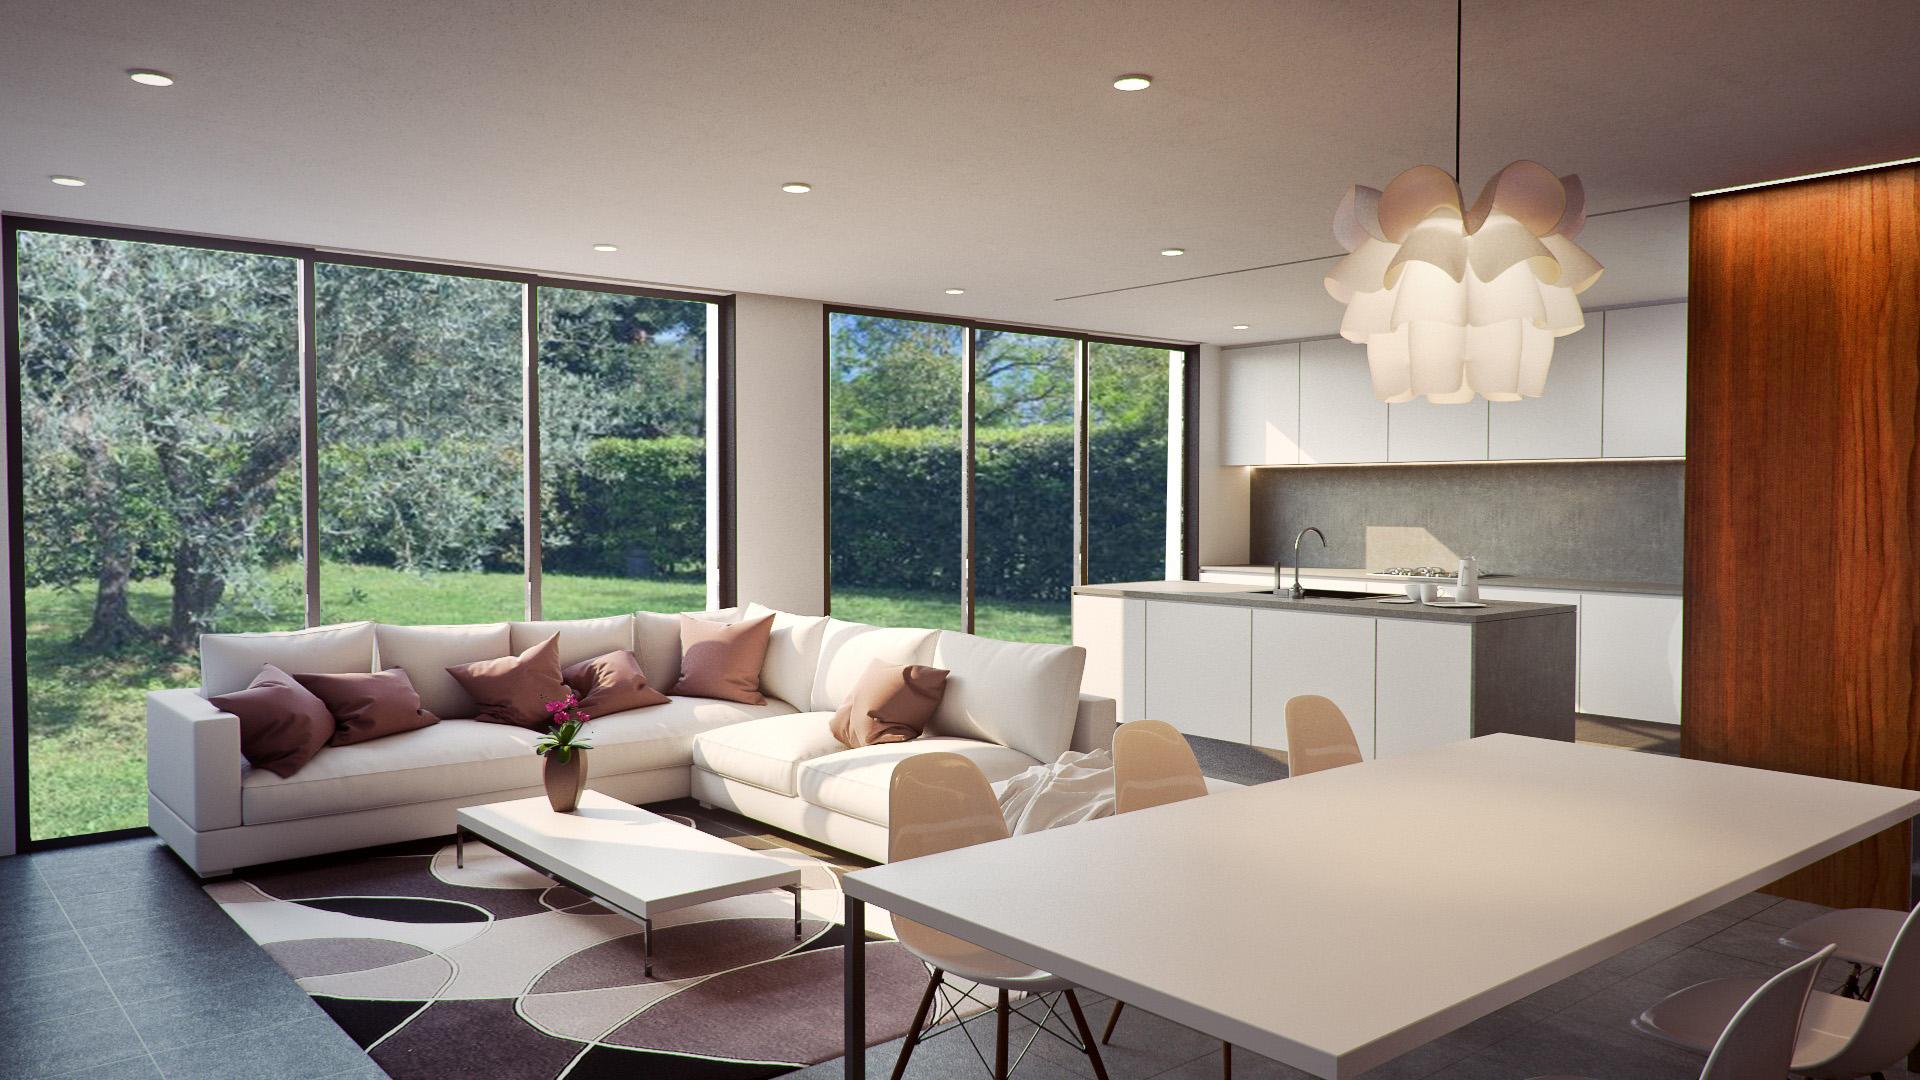 Appartamento 3.5 locali a Caslano – Residenza Regina